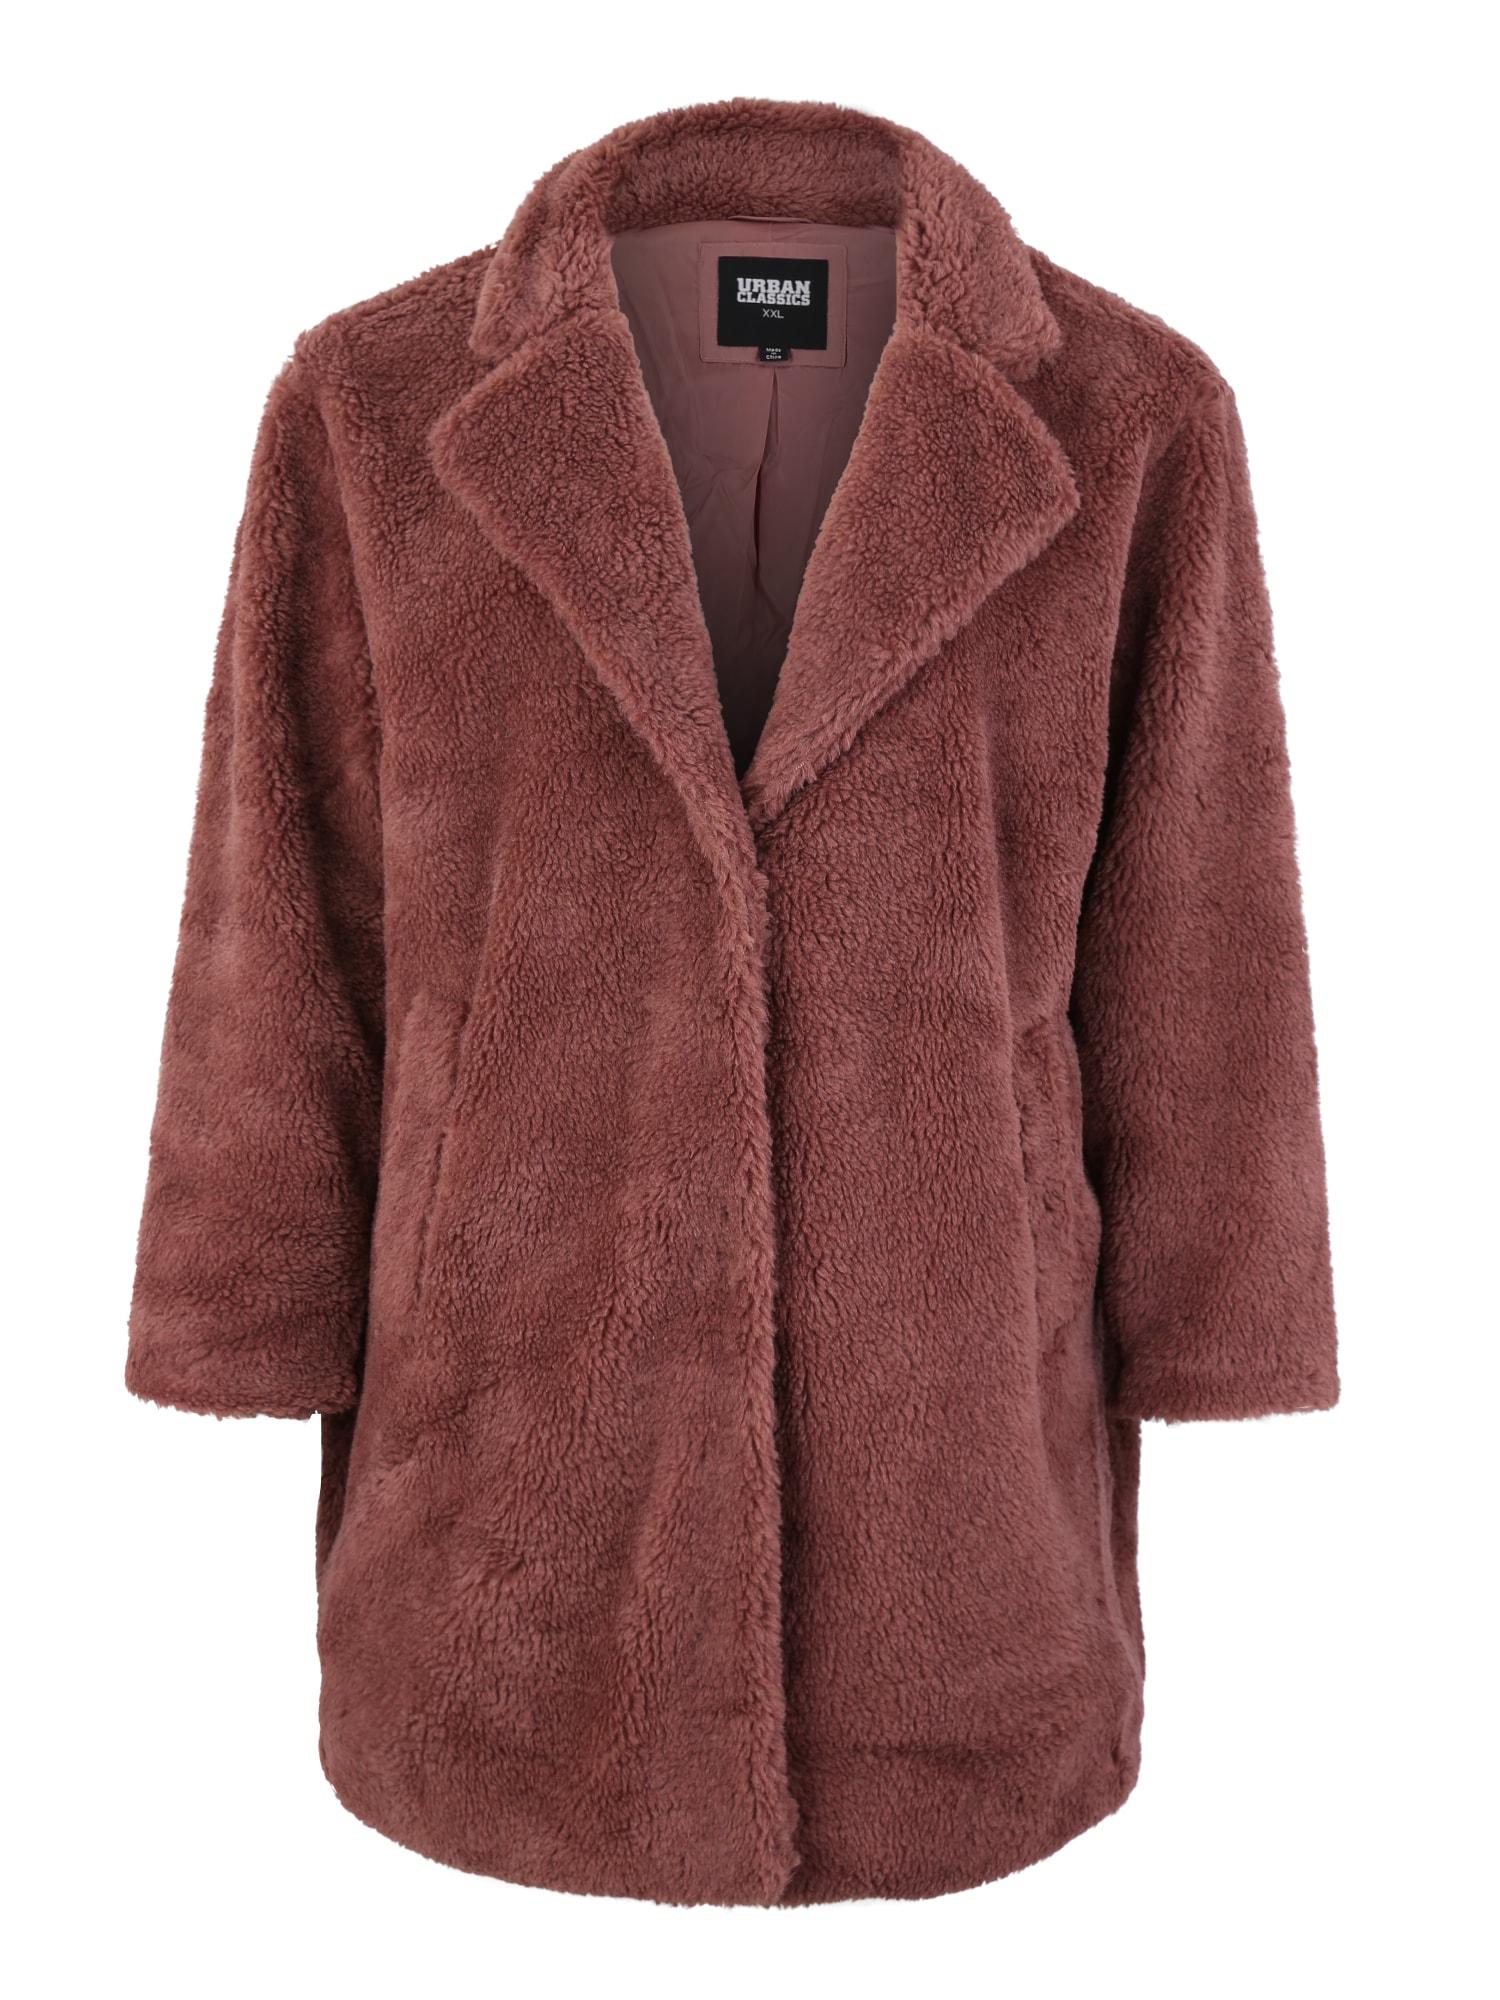 Urban Classics Curvy Rudeninis-žieminis paltas 'Sherpa Coat' ruda